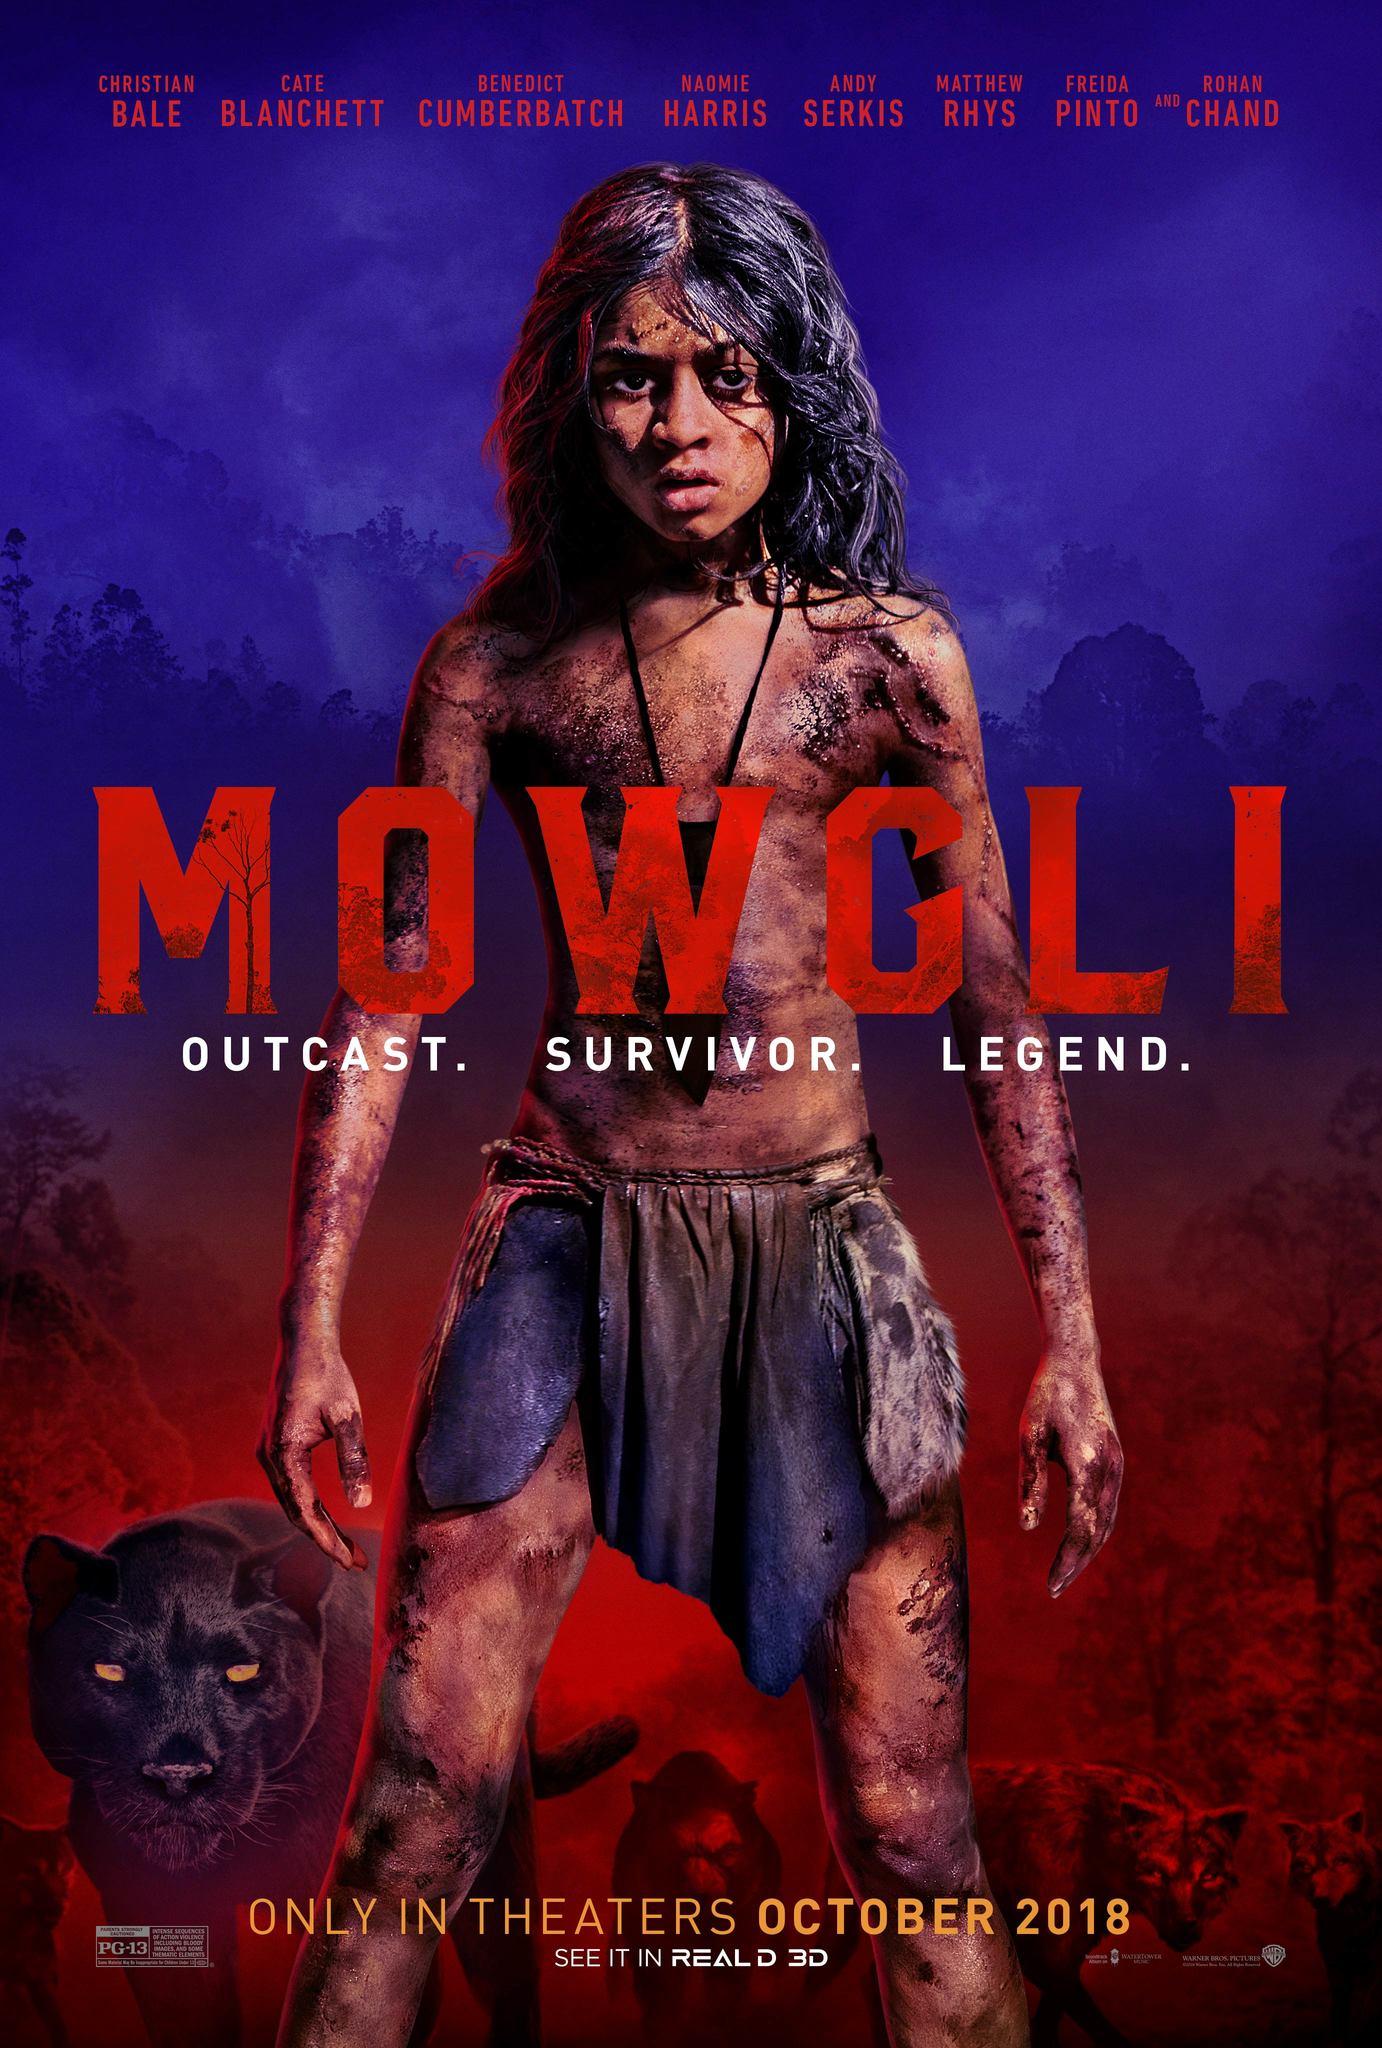 Rohan Chand in Mowgli (2018)